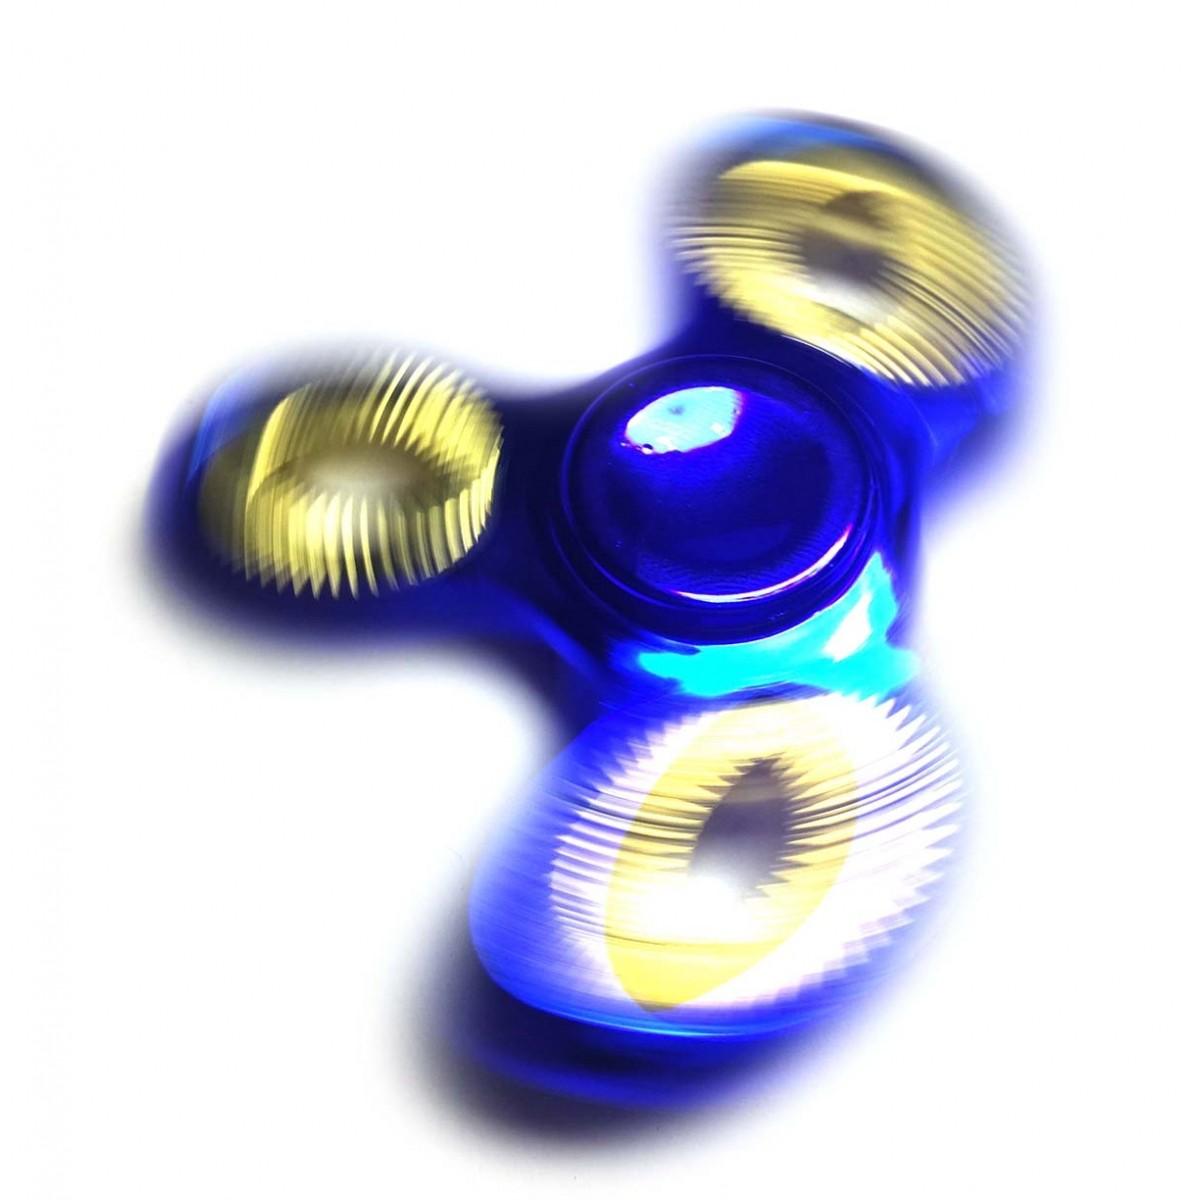 Hand Spinner Fidget de Metal Ansiedade Anti Estresse Giro Dourado Azul (bsl-gira-1-metal)